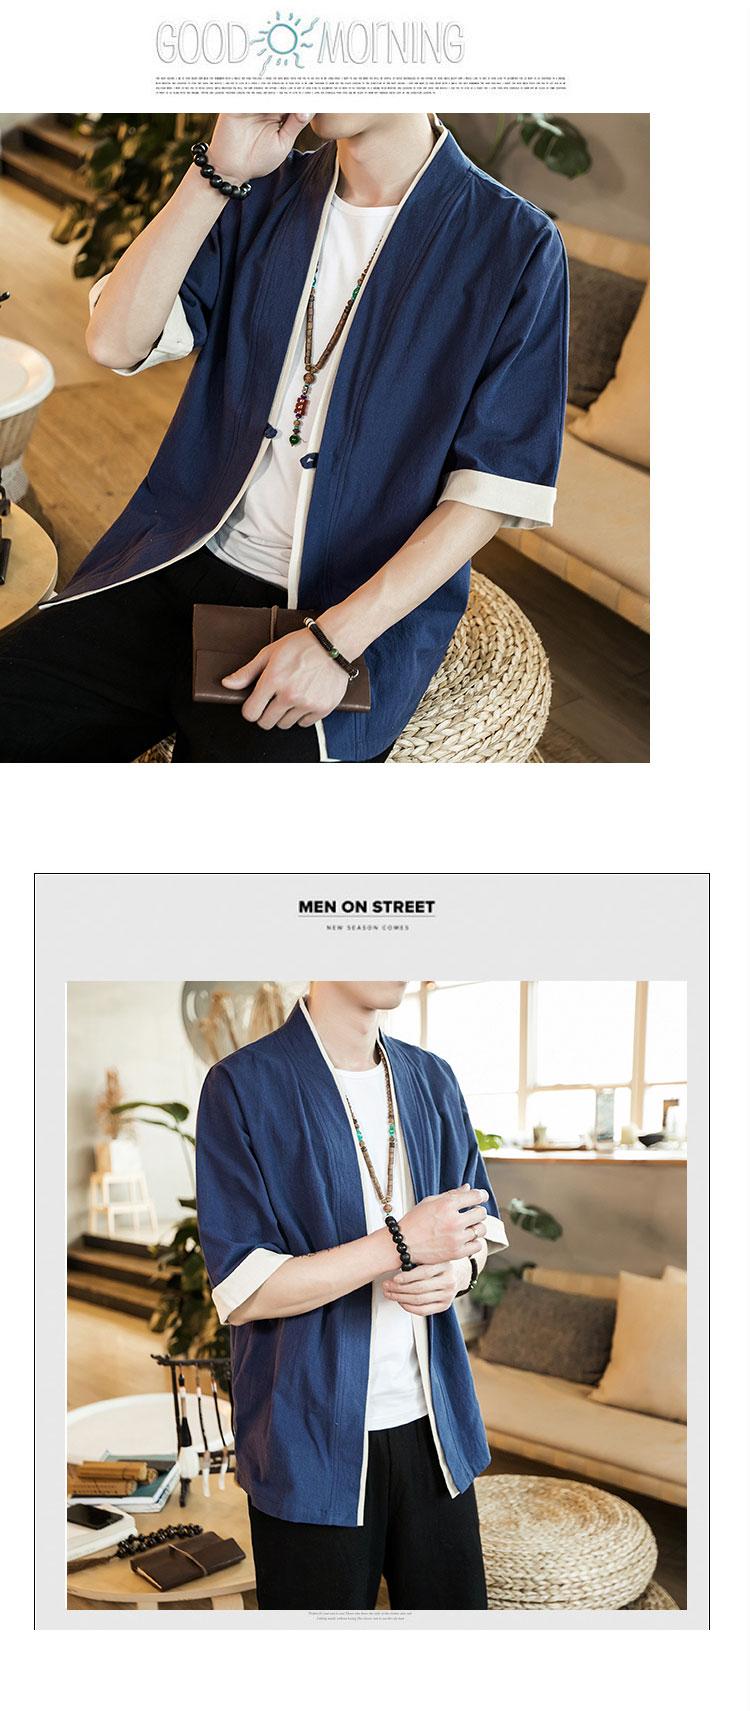 HTB1CSs.k5OYBuNjSsD4q6zSkFXav 2019 Men Cotton Linen Jacket China Style Kongfu Coat Male Loose Kimono Cardigan Overcoat Open Stitch Coat Mens Windbreaker 5XL